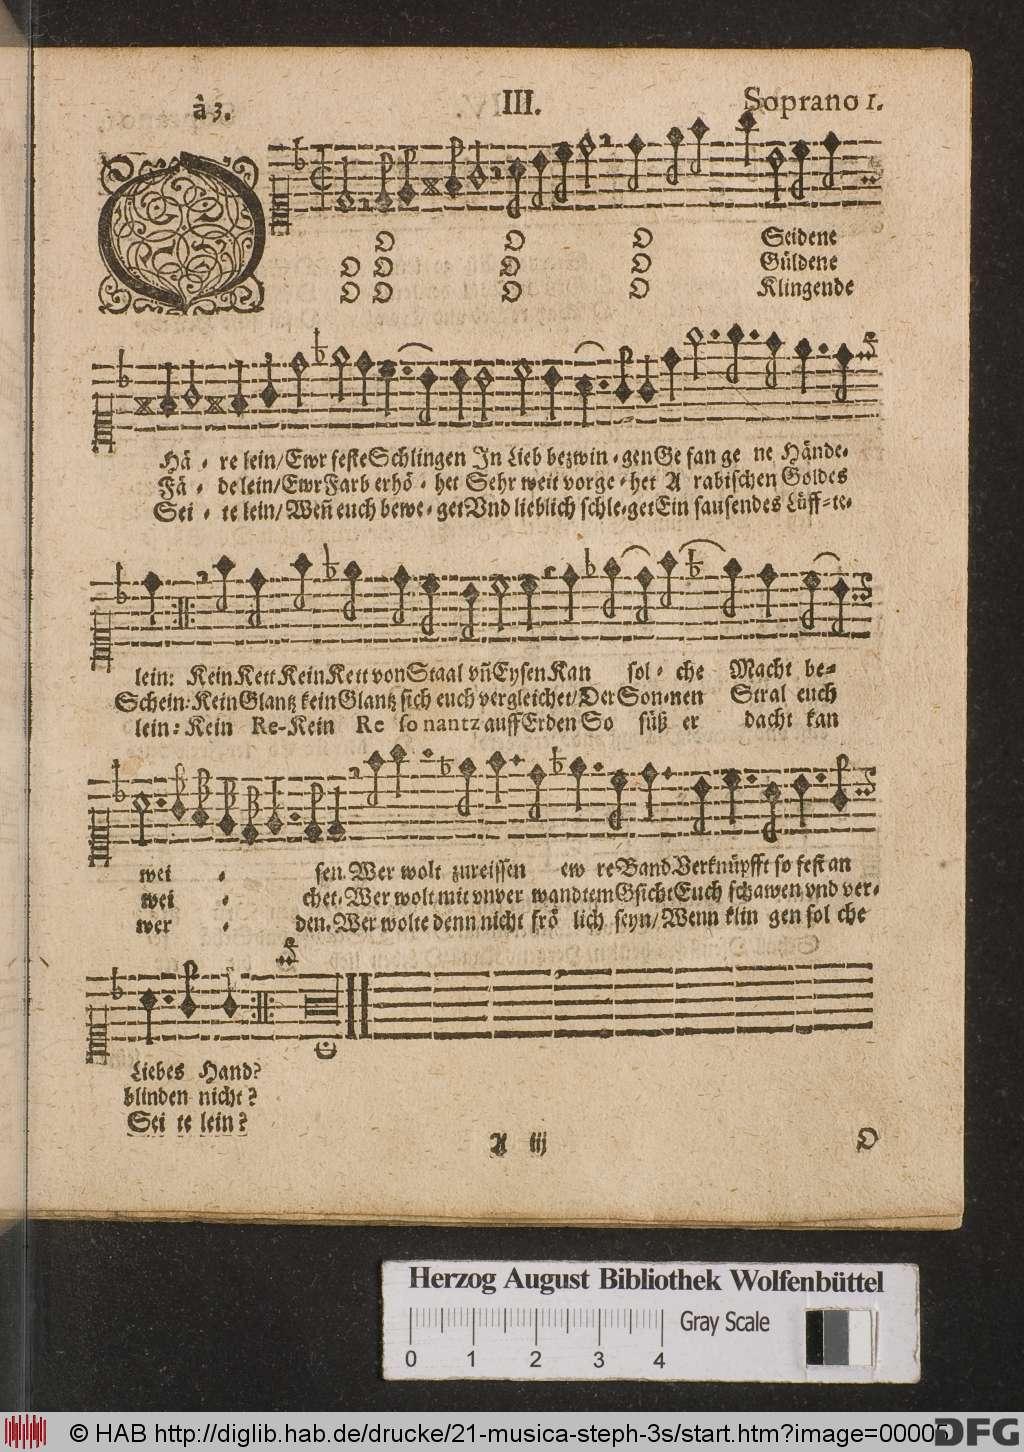 http://diglib.hab.de/drucke/21-musica-steph-3s/00005.jpg